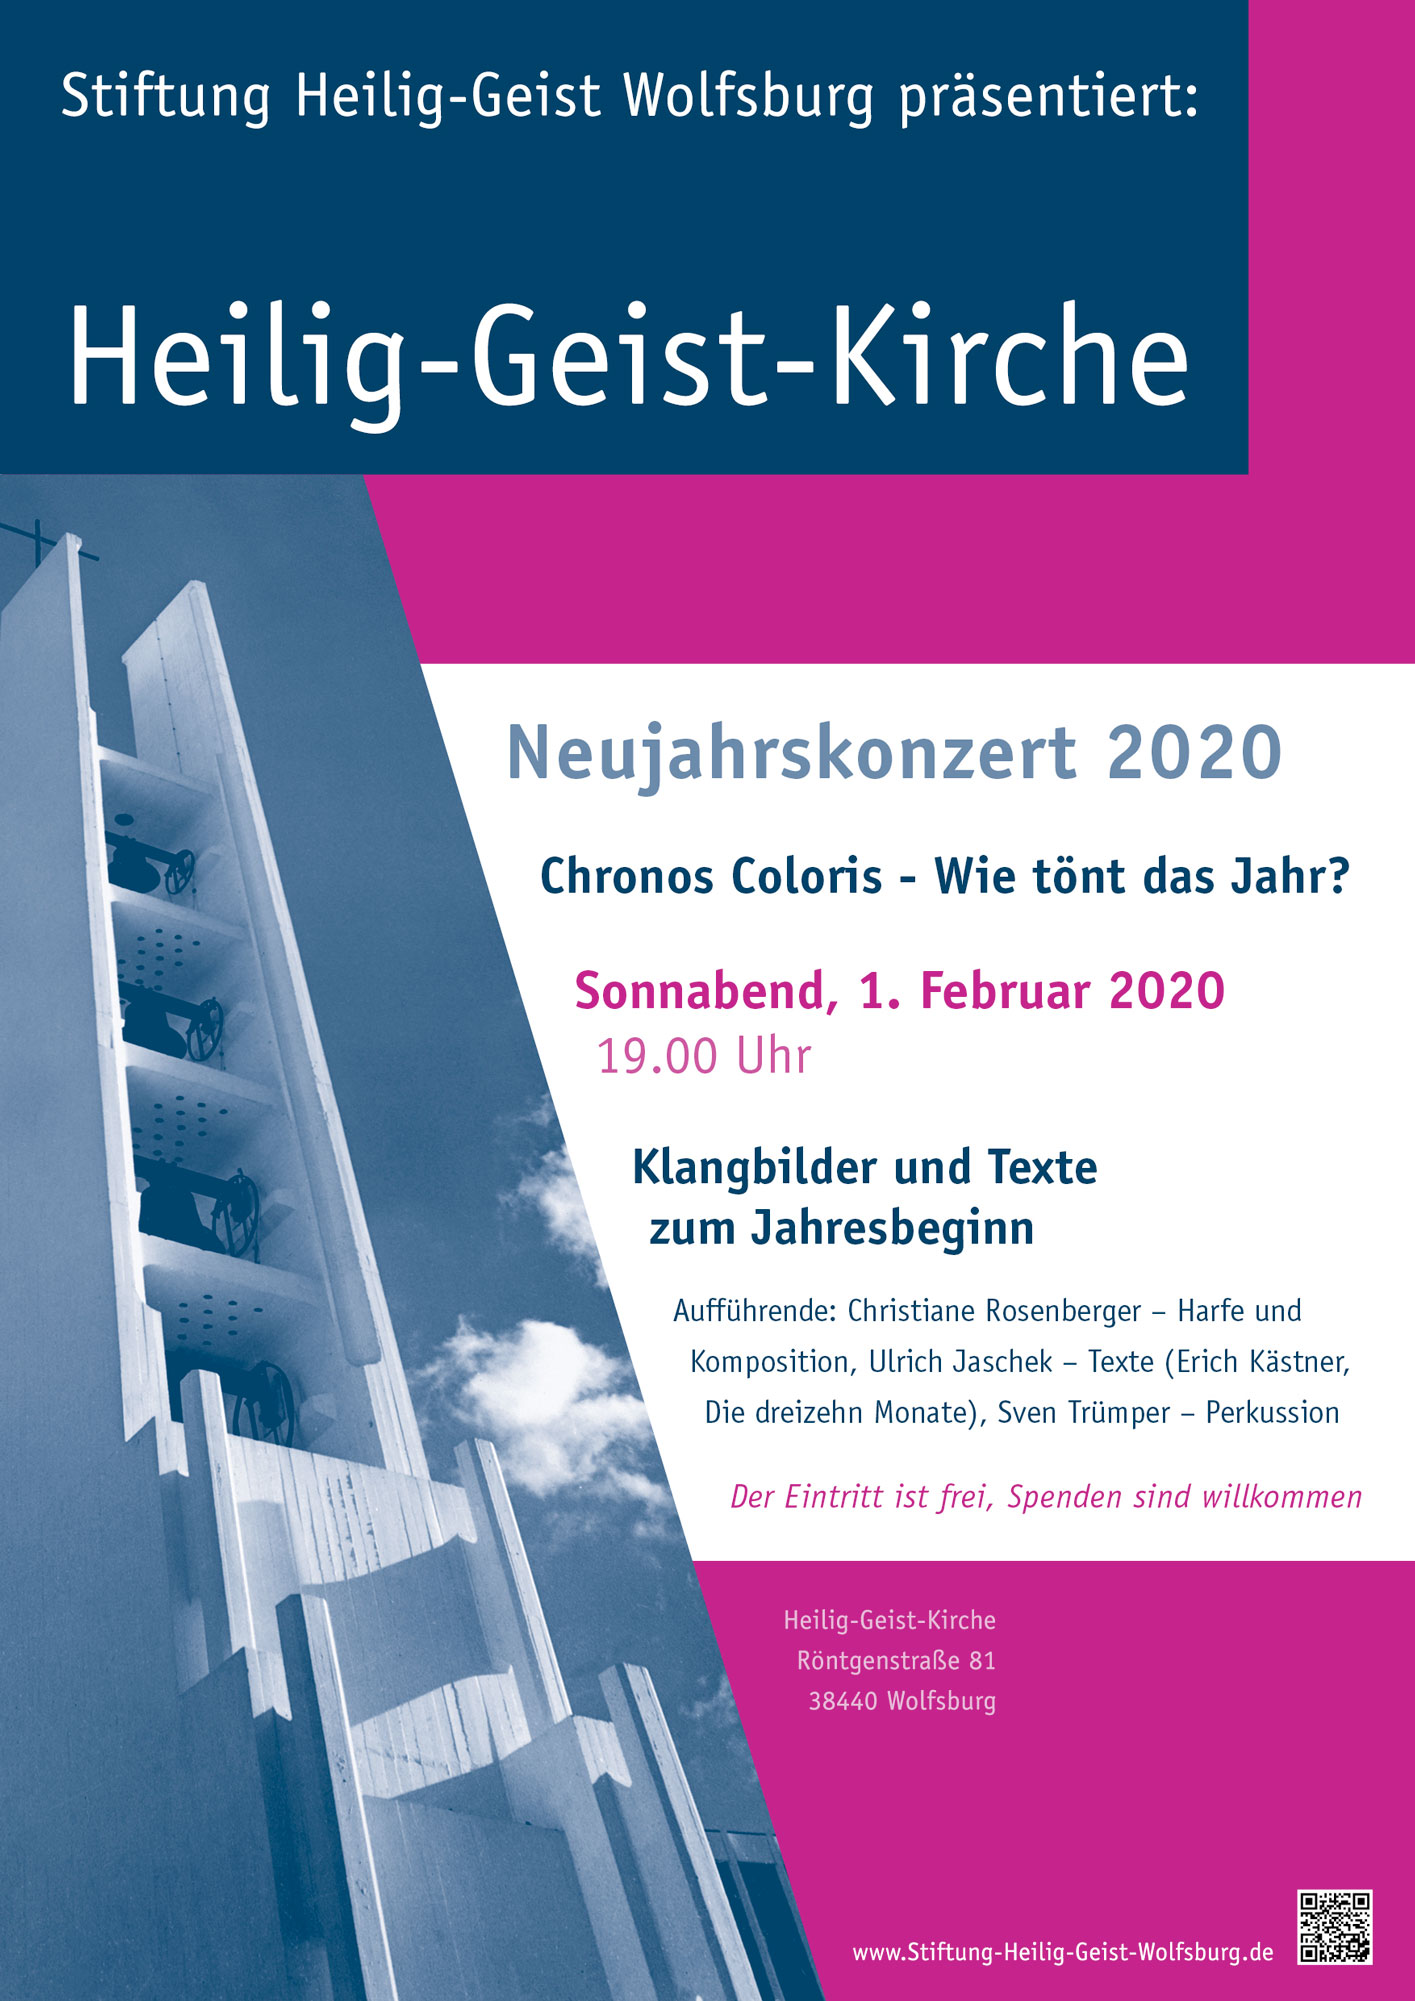 Heilig-Geist-Kirche-Plakat-2020-Neujahrskonzert